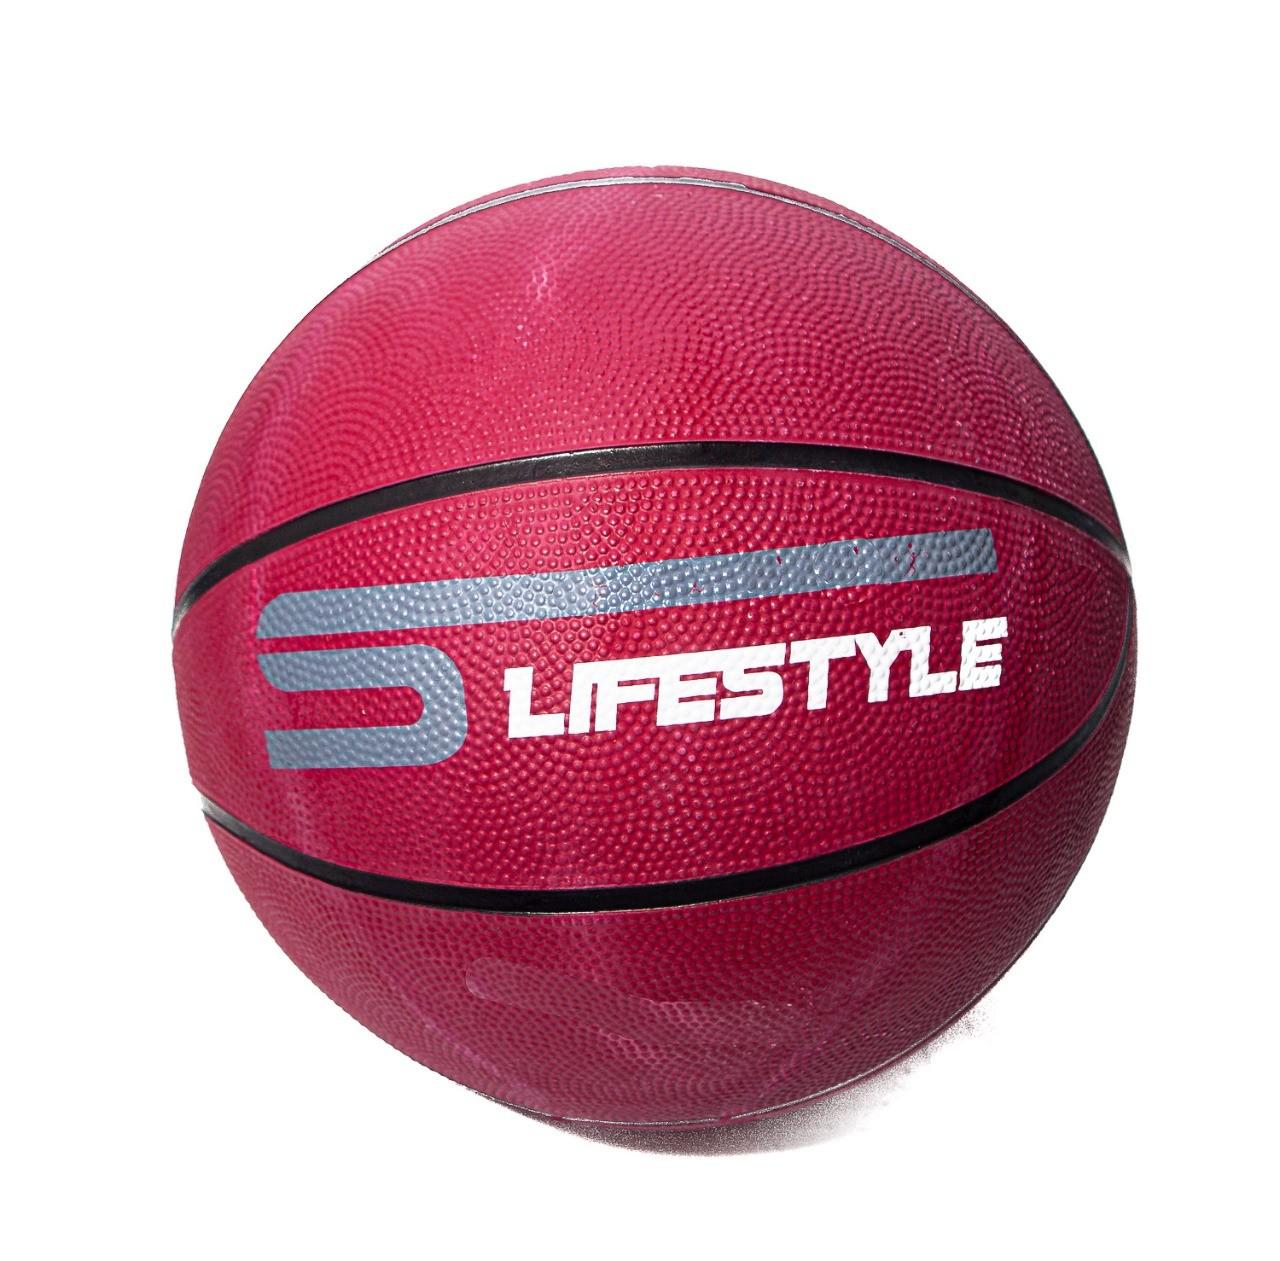 Bola de Basquete Borracha Vinho Medida 33cm - LifeStyle  -  Mothelucci Loja online